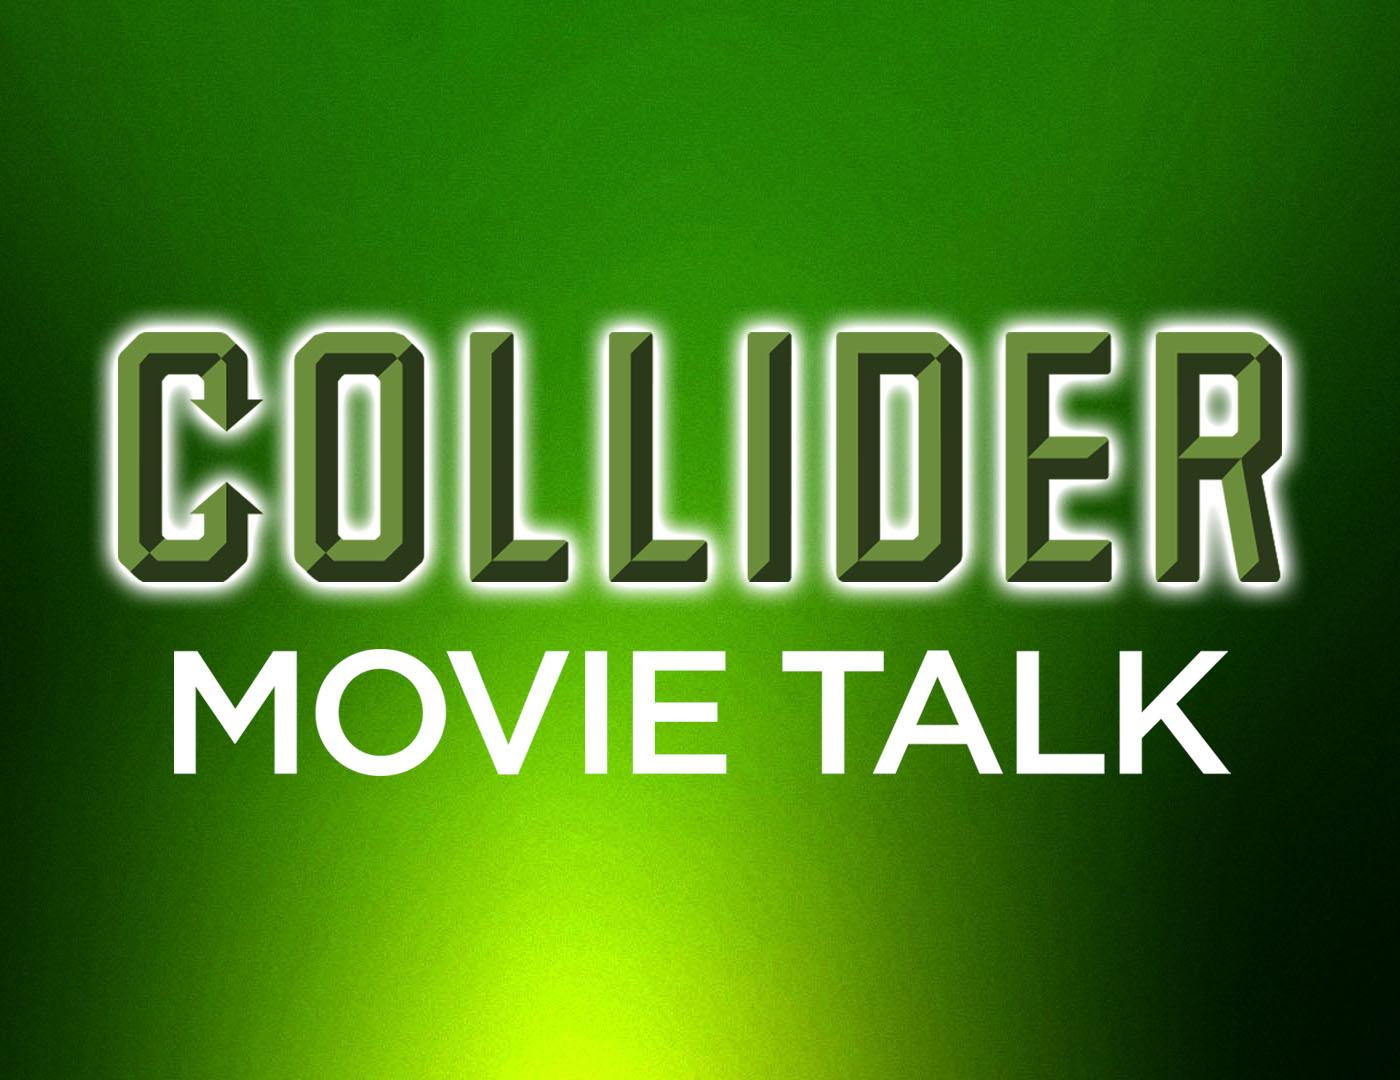 Doctor Strange Confirmed In Avengers: Infinity War - Collider Movie Talk